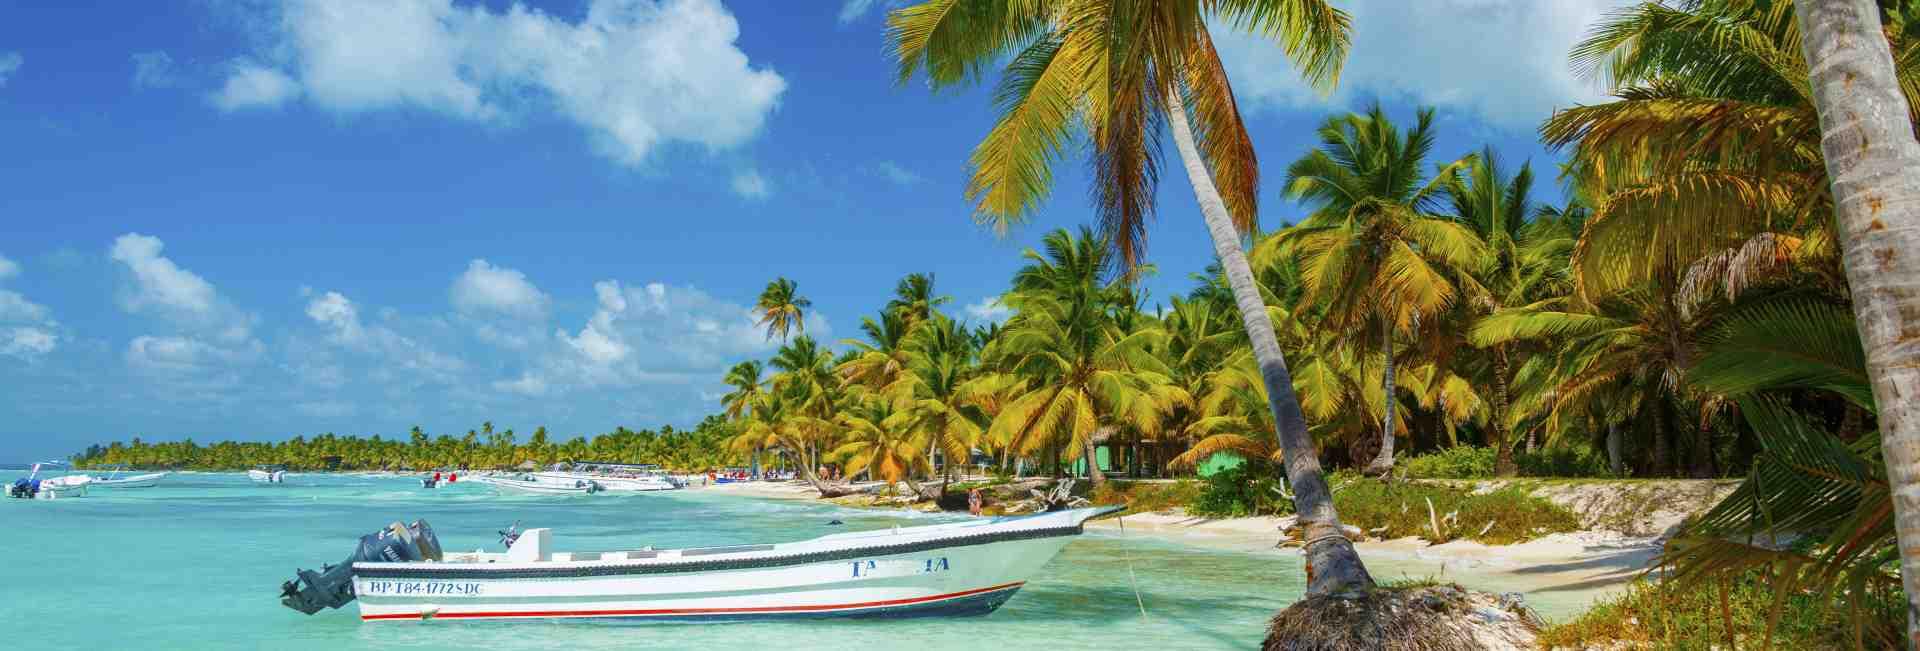 שייט בקריביים